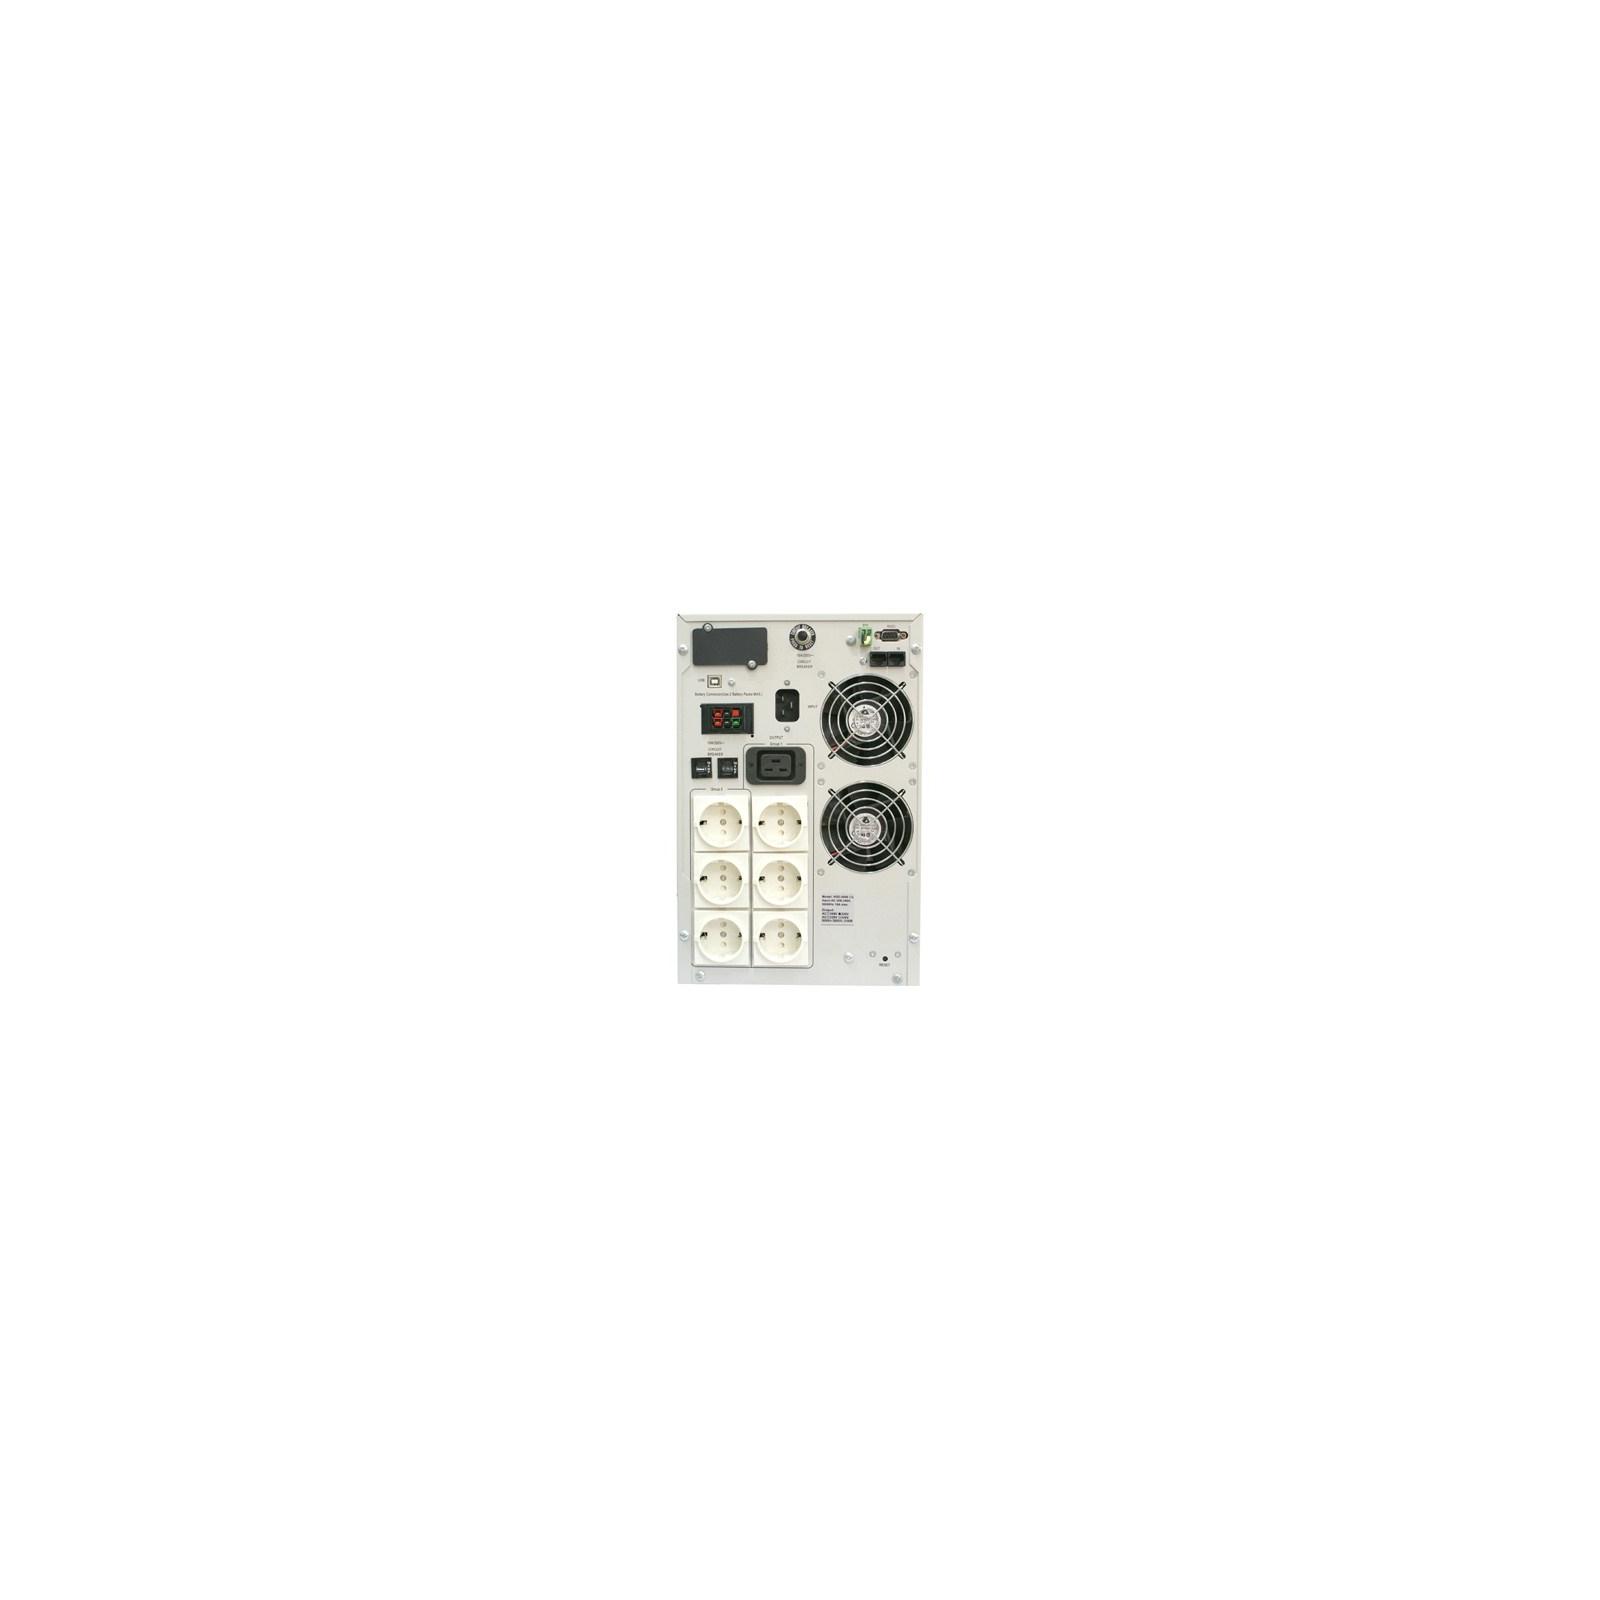 Батарея к ИБП VGD-2000/3000 RM Powercom (RM-2K) изображение 2